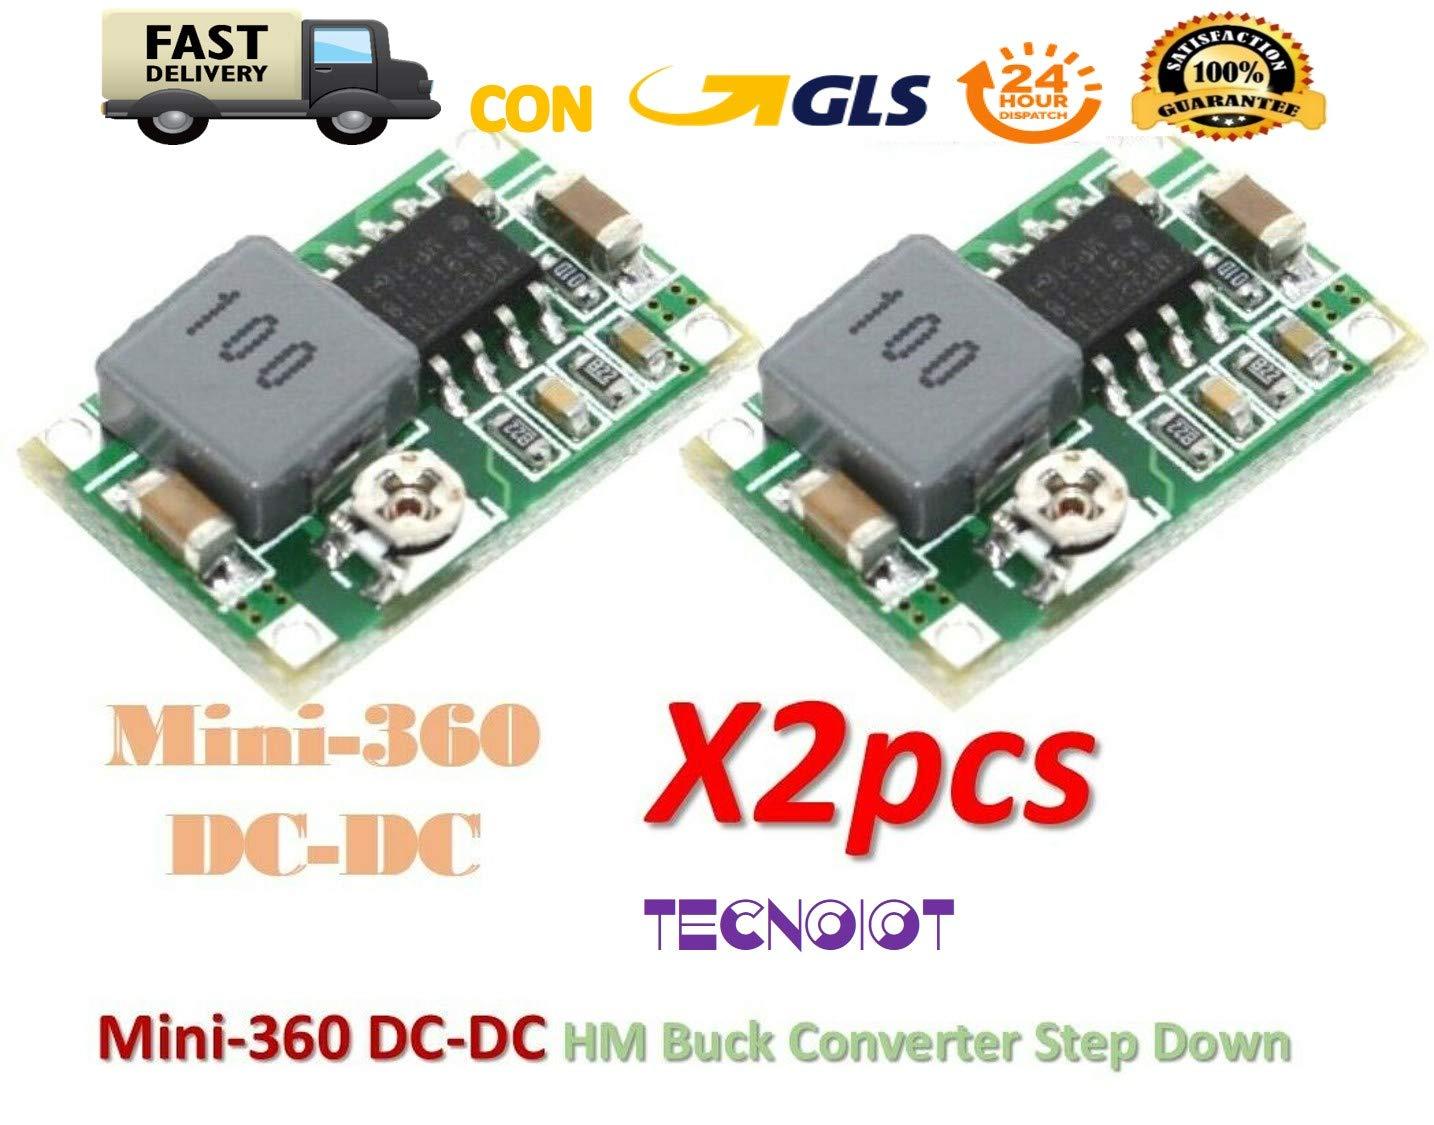 TECNOIOT 2pcs Mini360 Mini-360 DC-DC HM Buck Converter Step Down Power Supply Ultra-Small